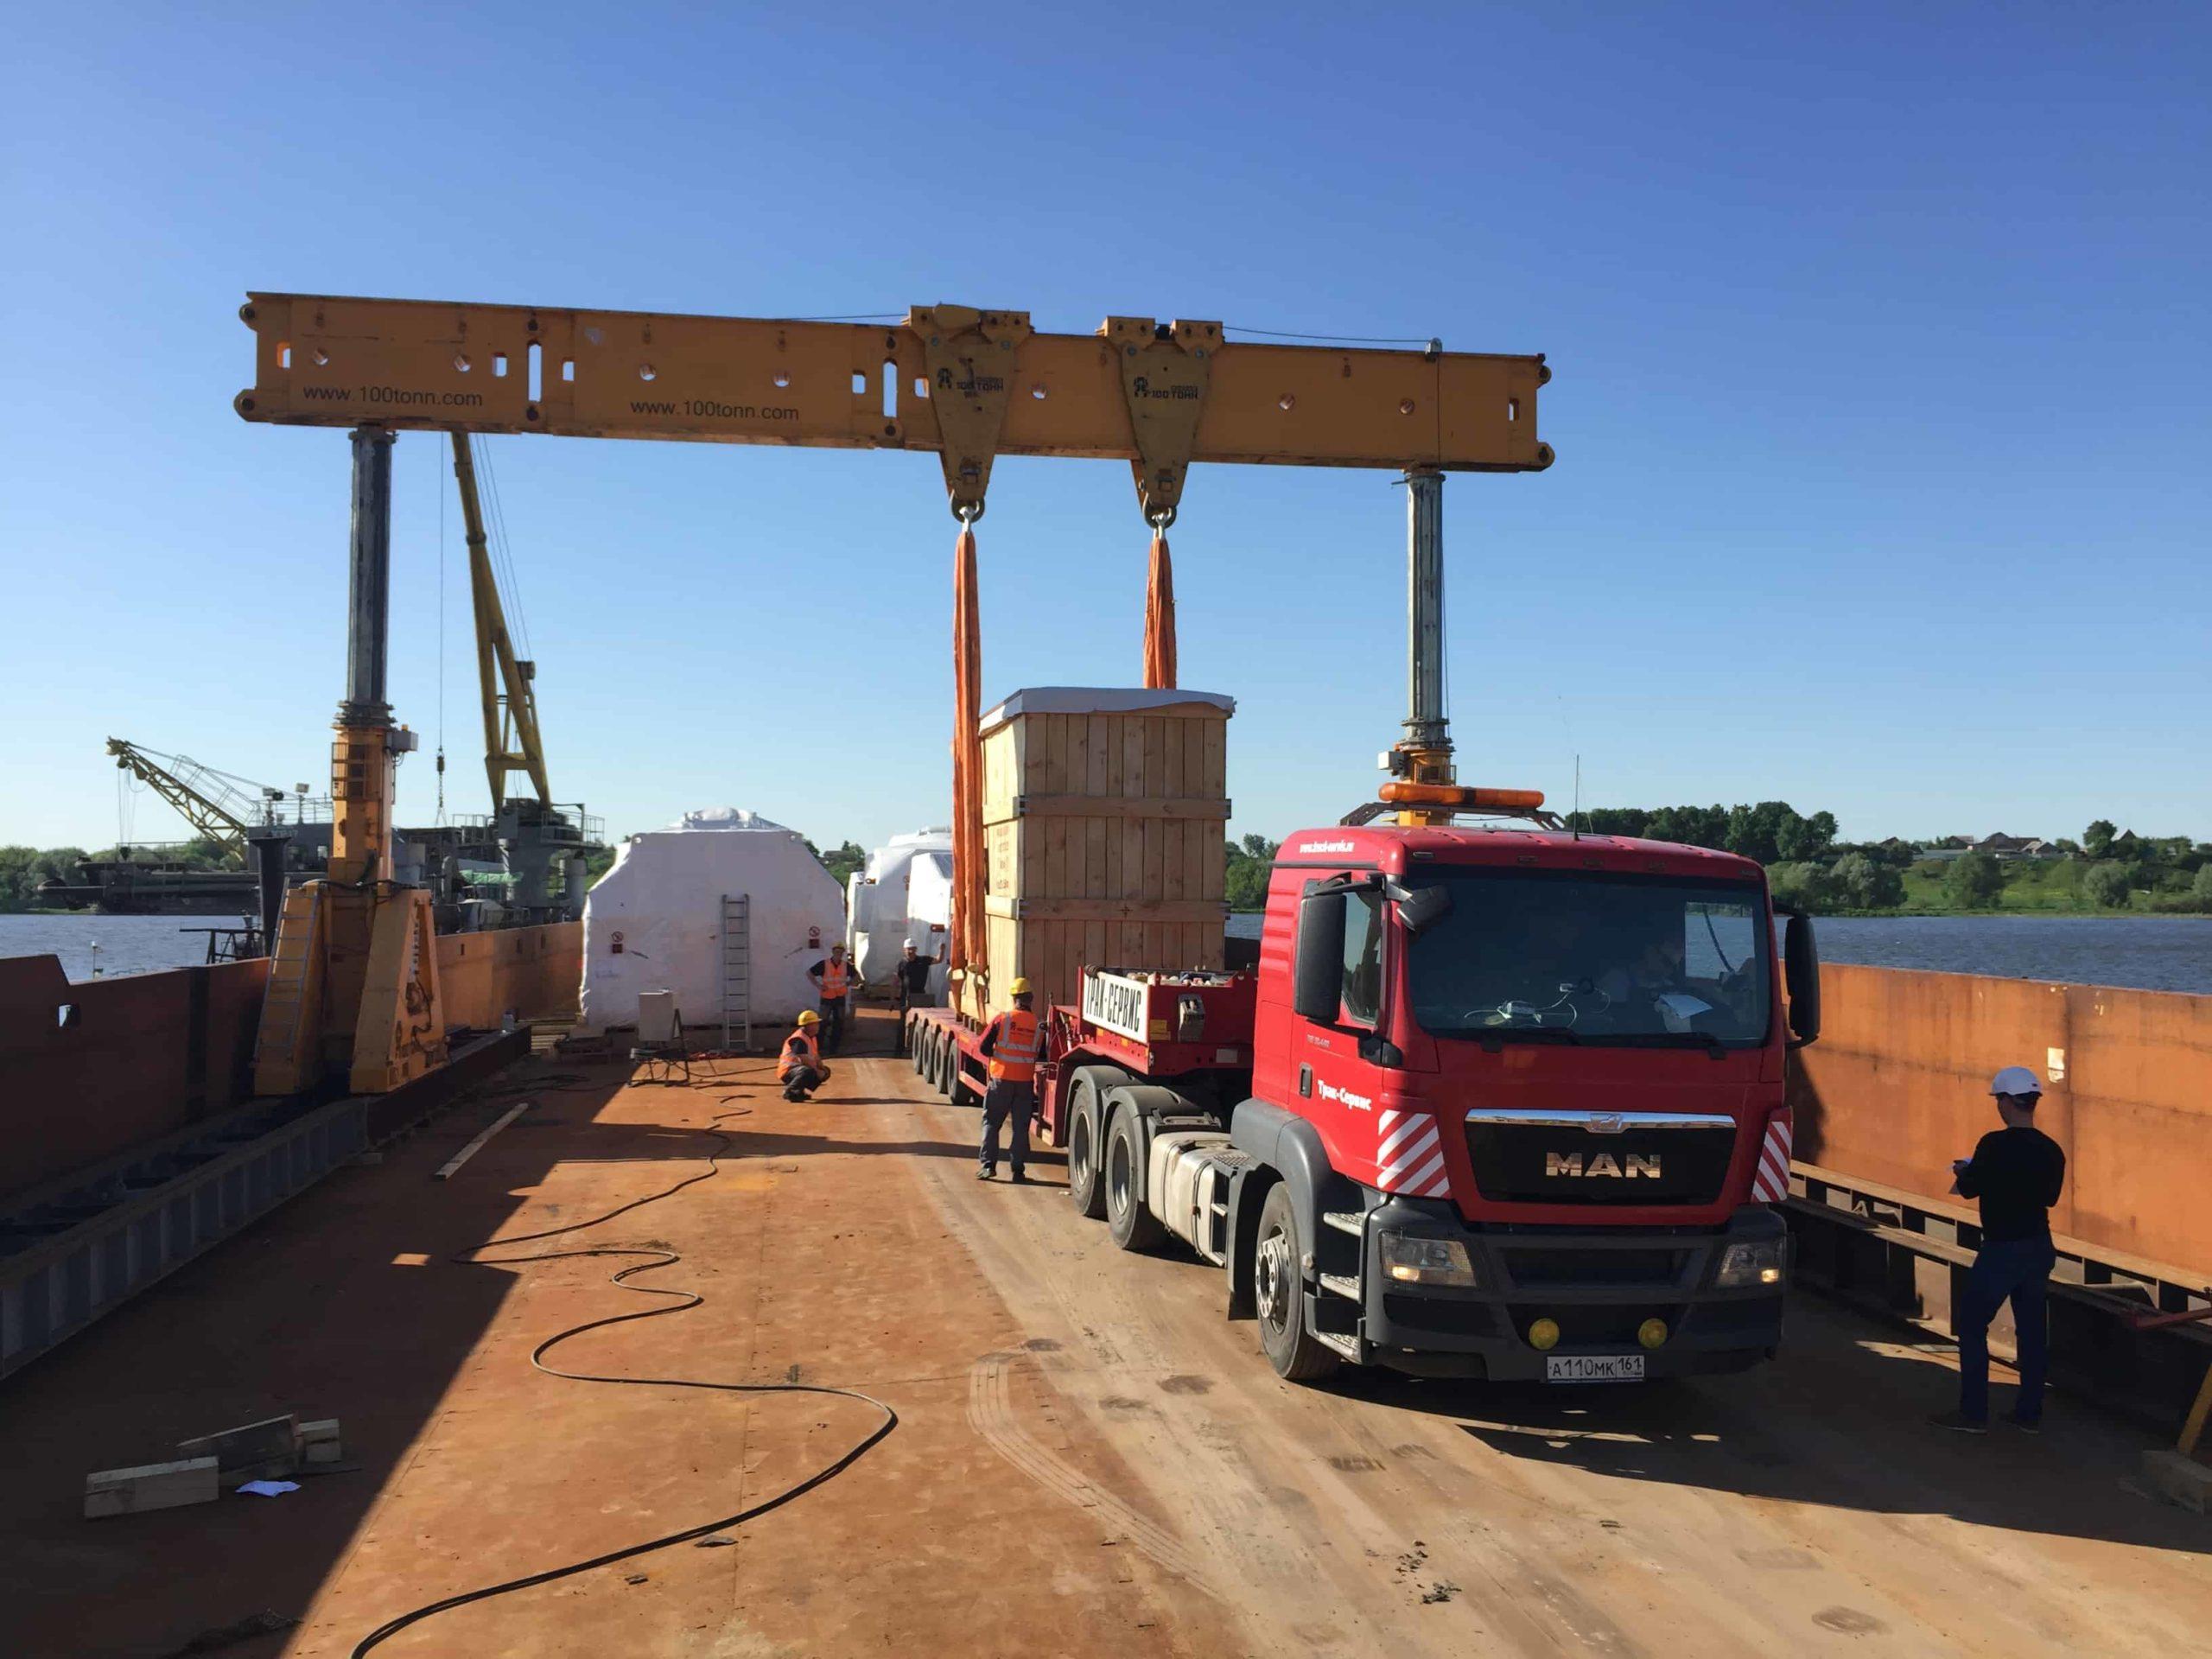 Погрузка Mobile bolster весом 47 тонн в порту Коломна